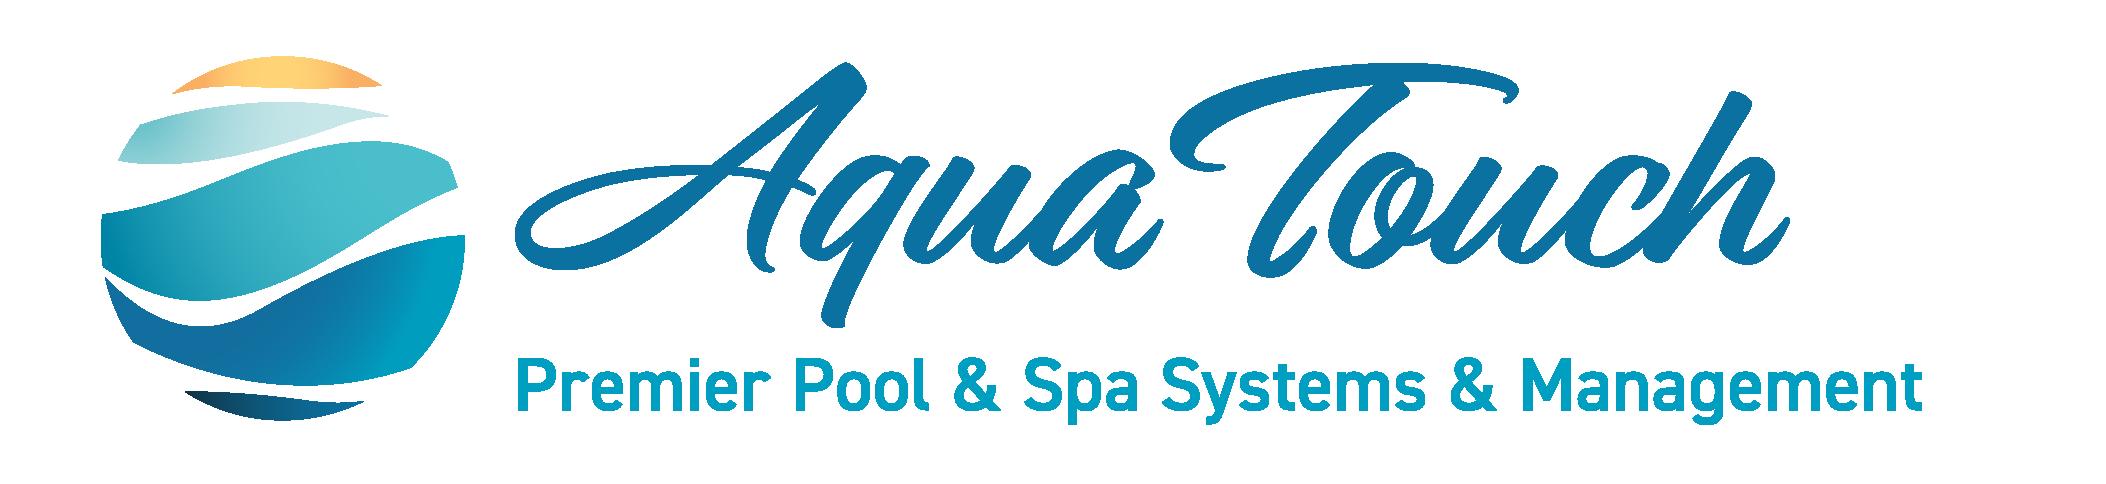 Aqua Touch Premier Pool & Spa Systems & Management